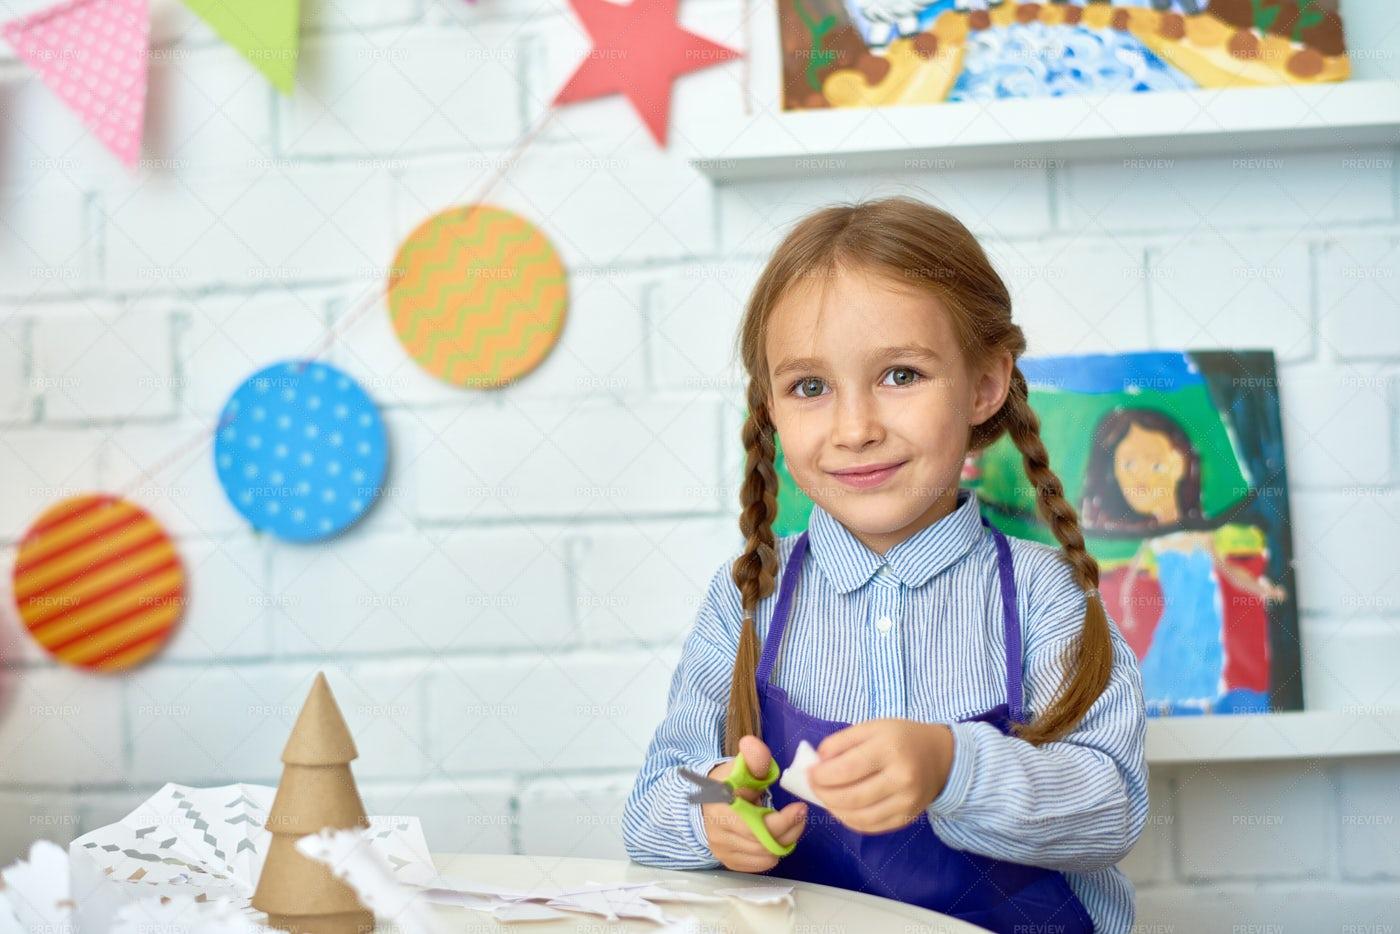 Cute Girl Making Christmas...: Stock Photos